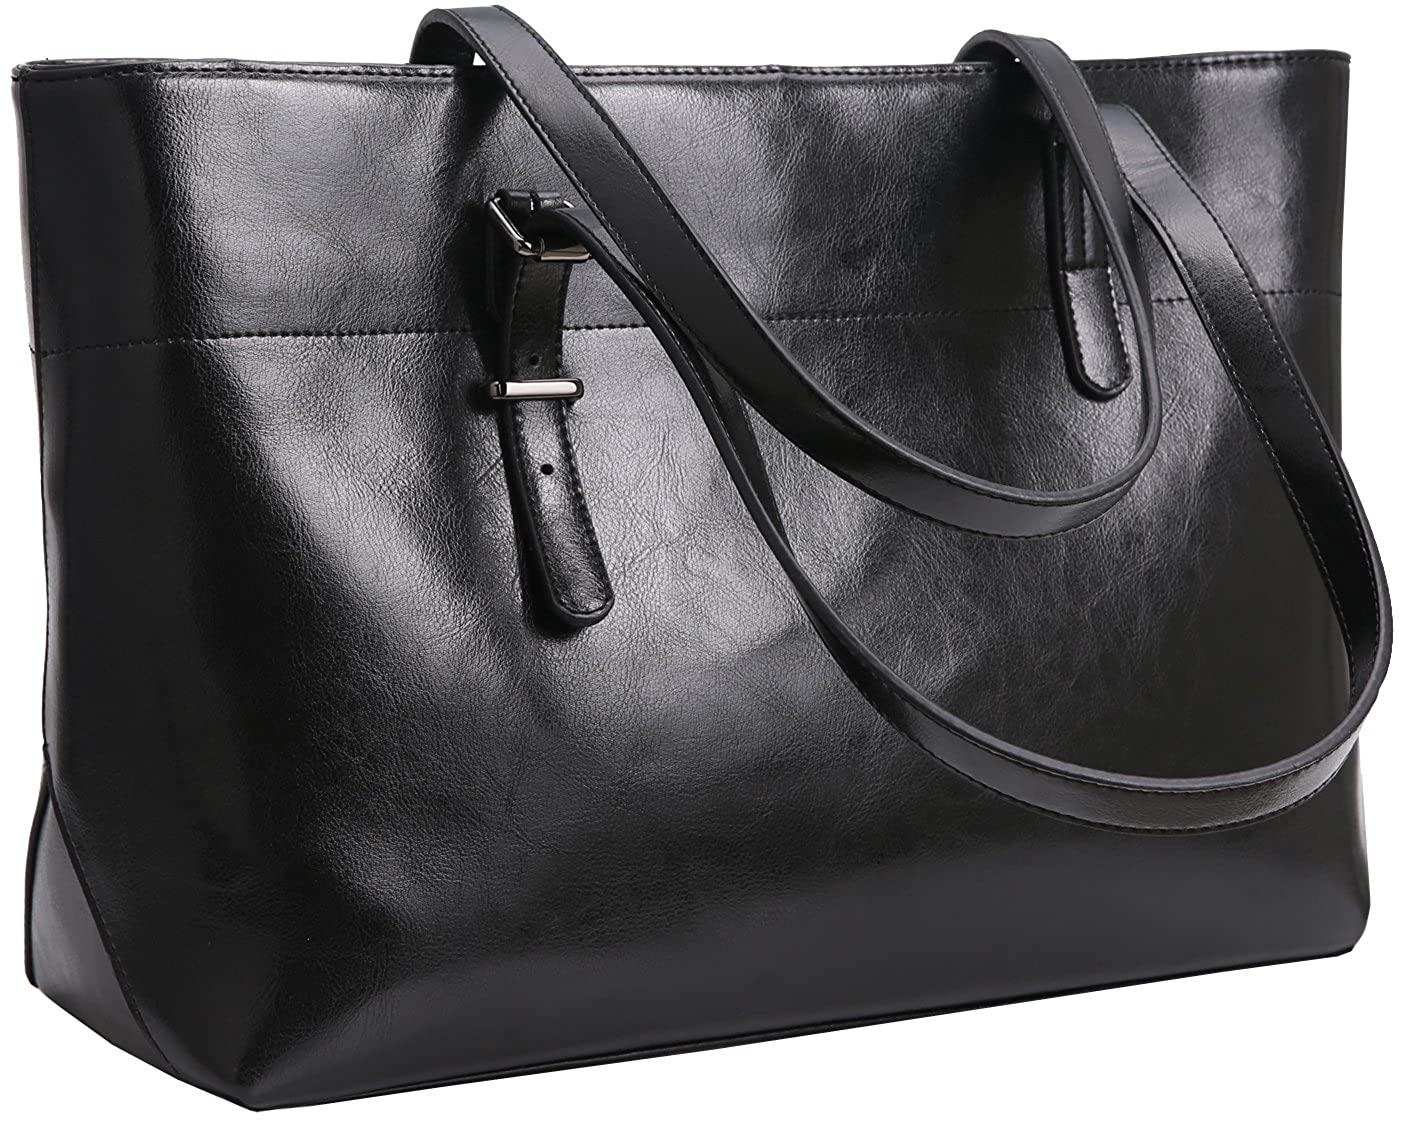 f57b5b39e8de Iswee Womens Leather Shoulder Handbag Tote Bags Top Handle Bag Designer  Ladies Purses Fashion Large Capacity Bags